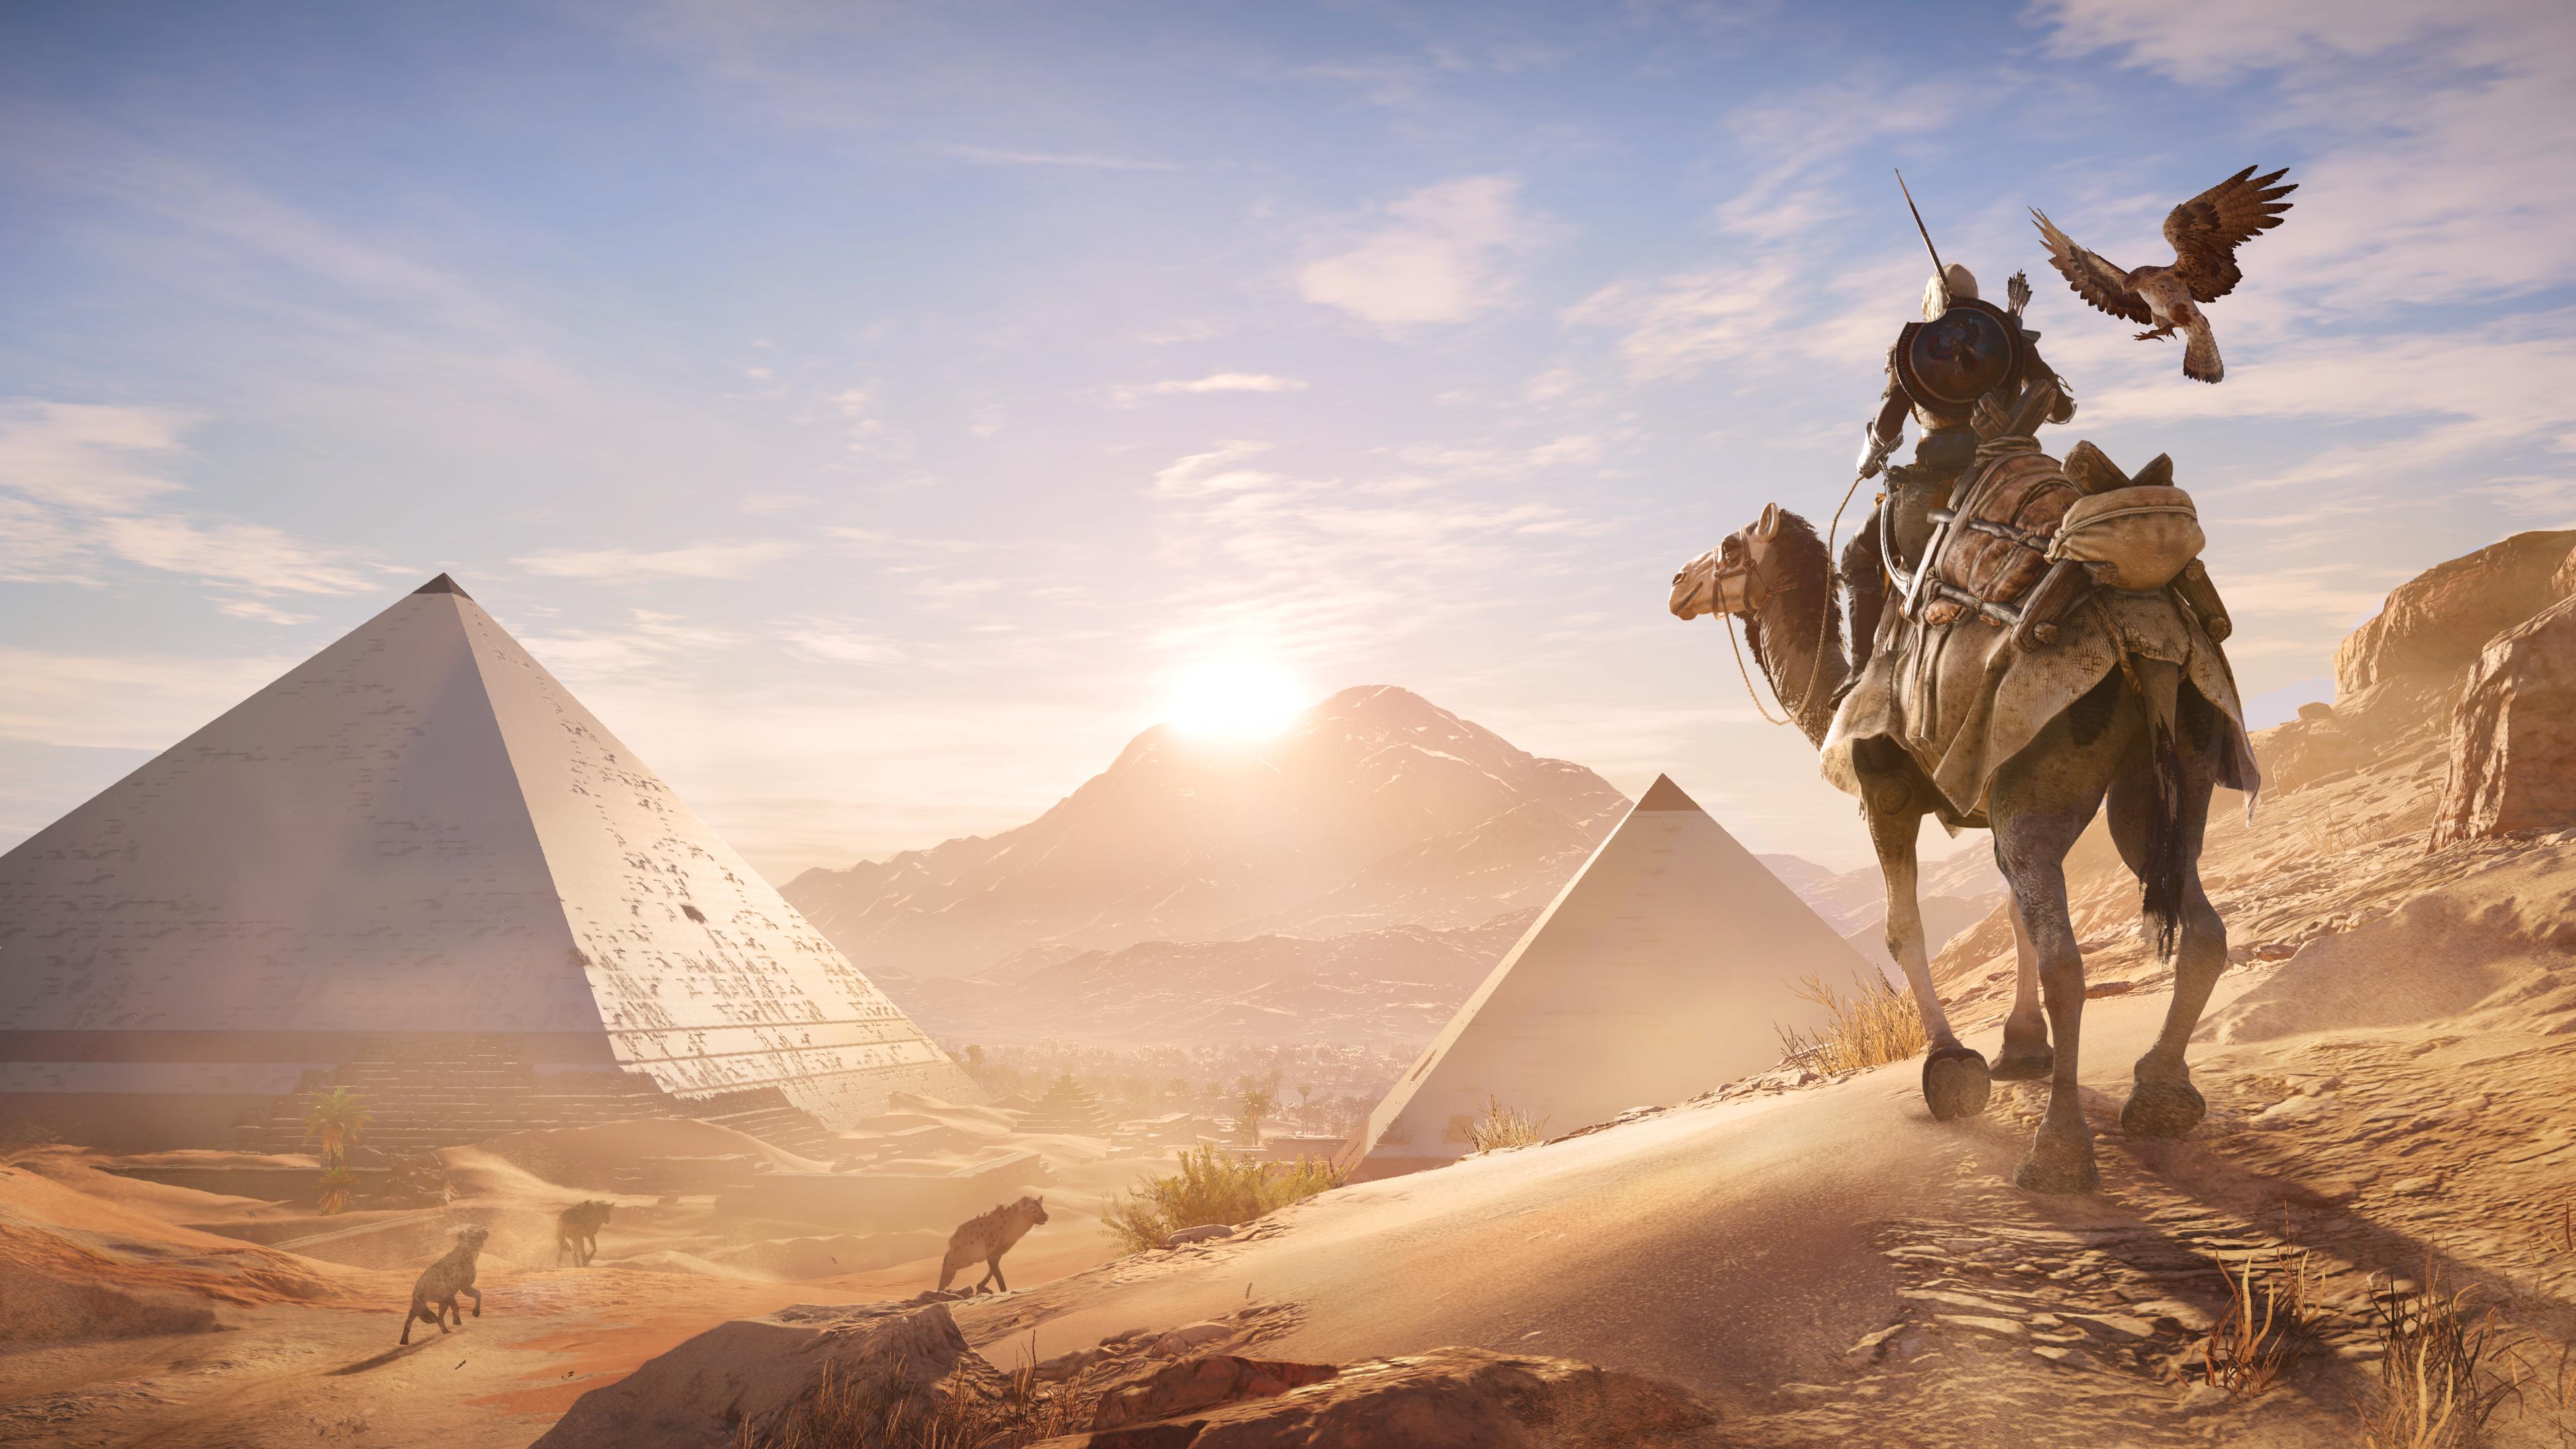 Sneak Peek: Assassin's Creed: Origins Gameplay + Free Roam